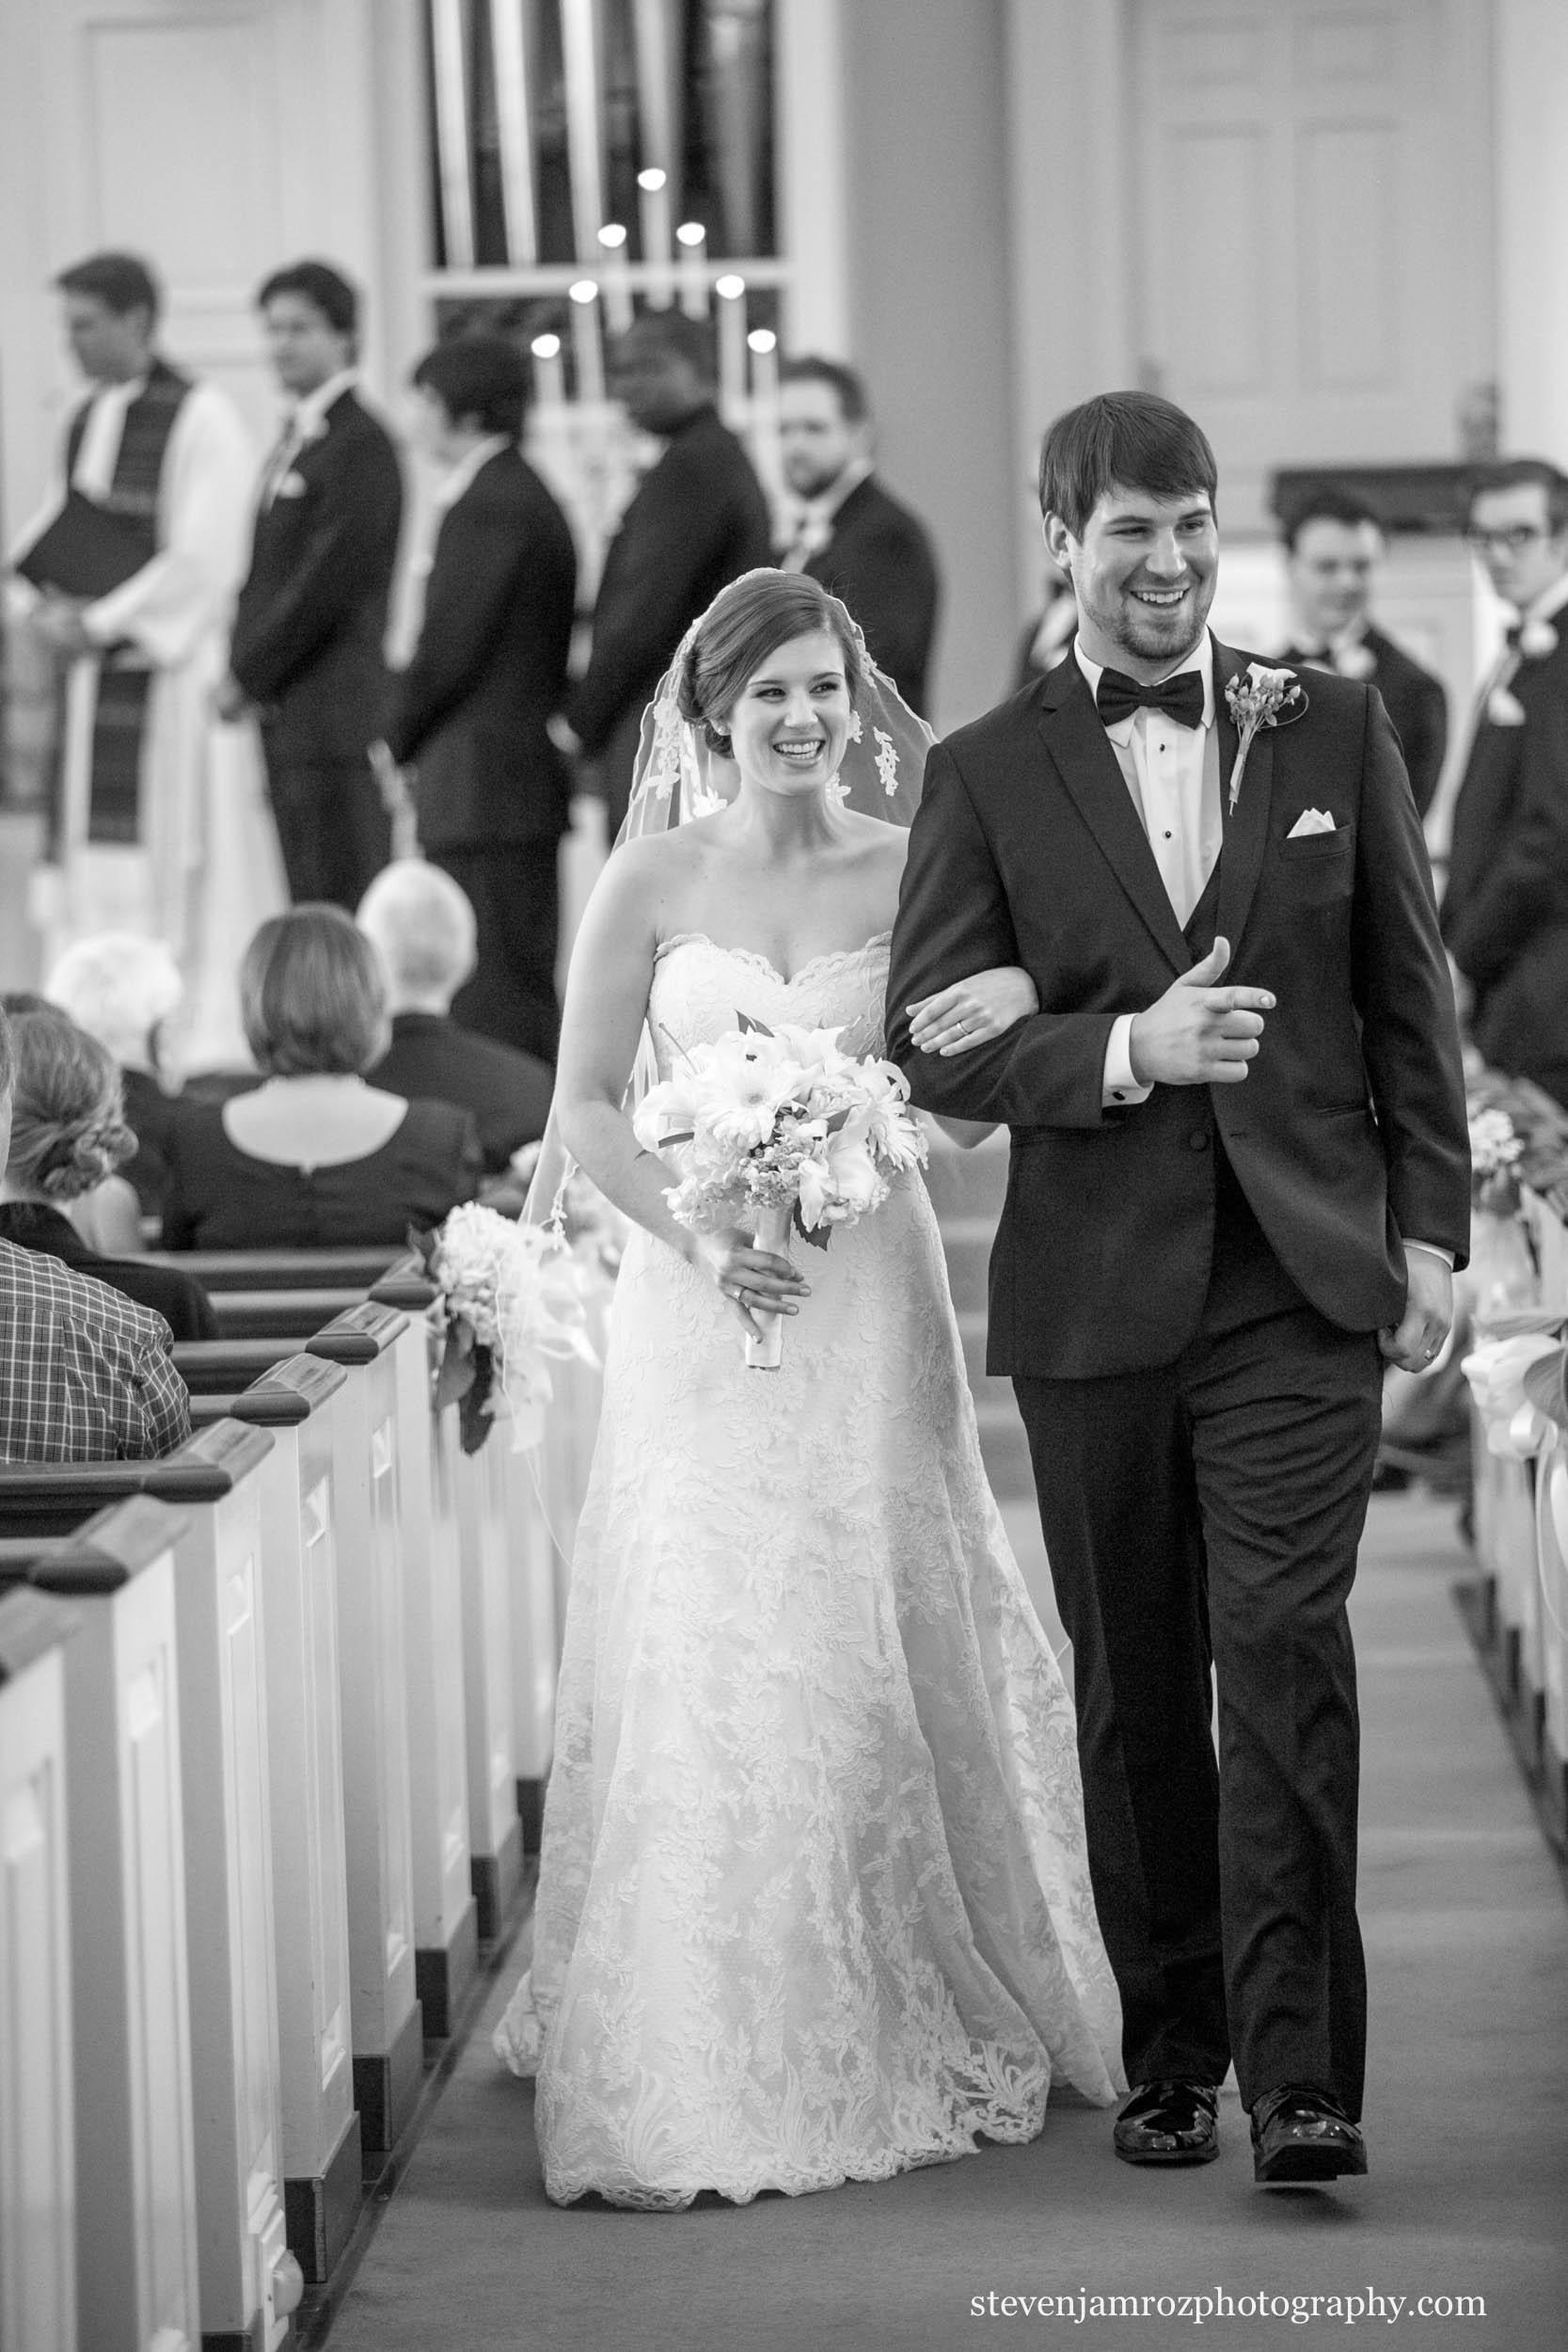 jones-chapel-meredith-recessional-wedding-steven-jamroz-photography-0740.jpg